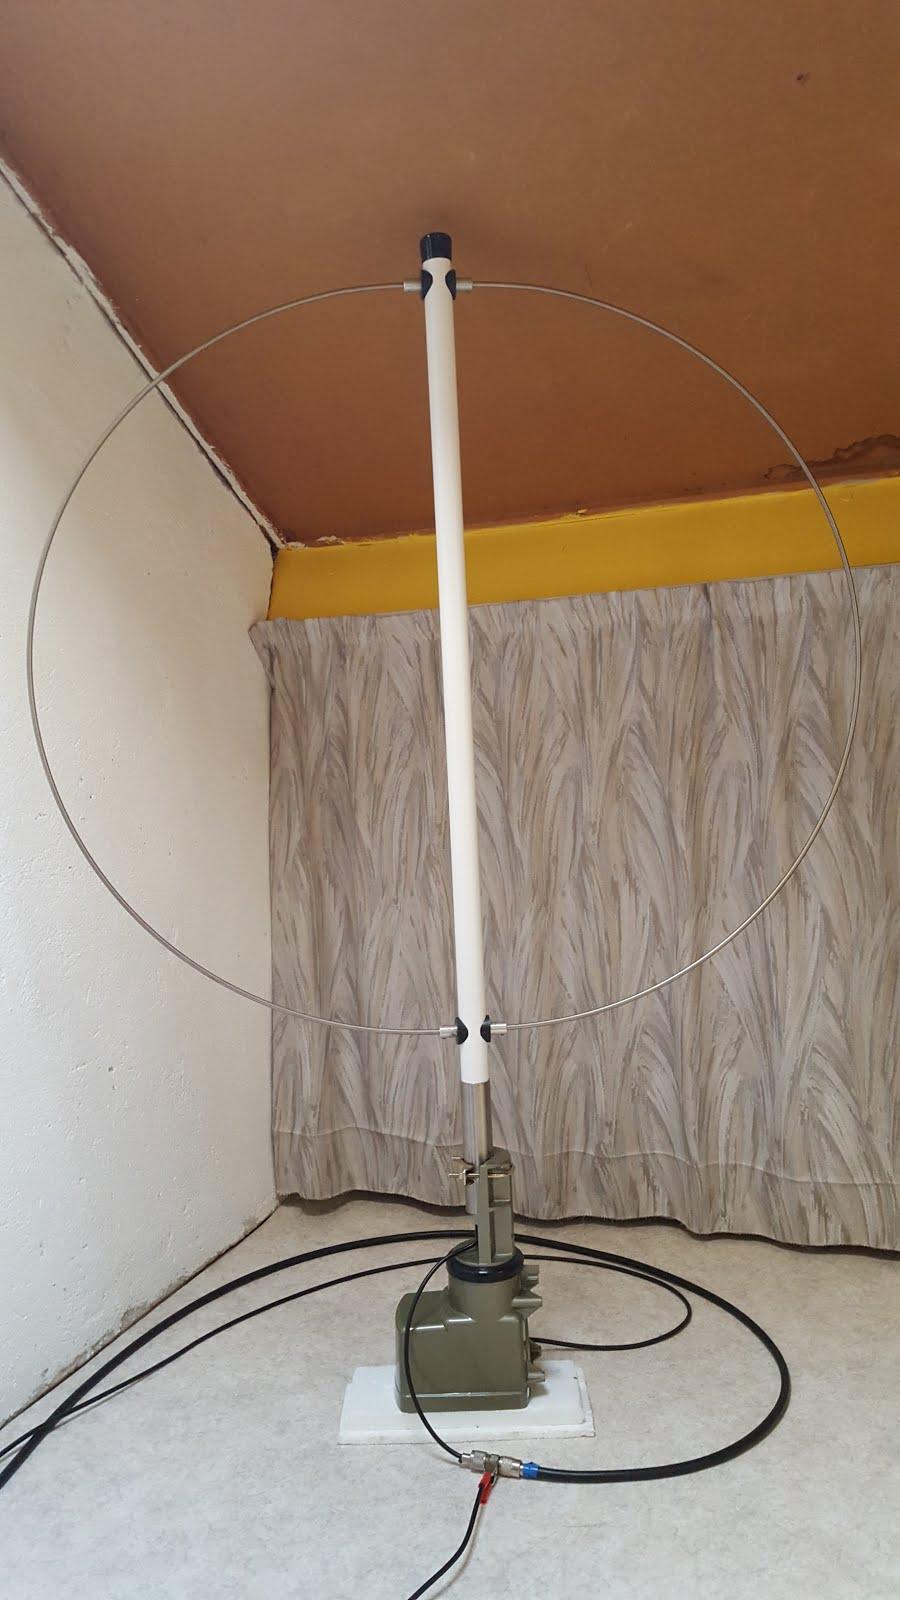 Rafansys LRX-30